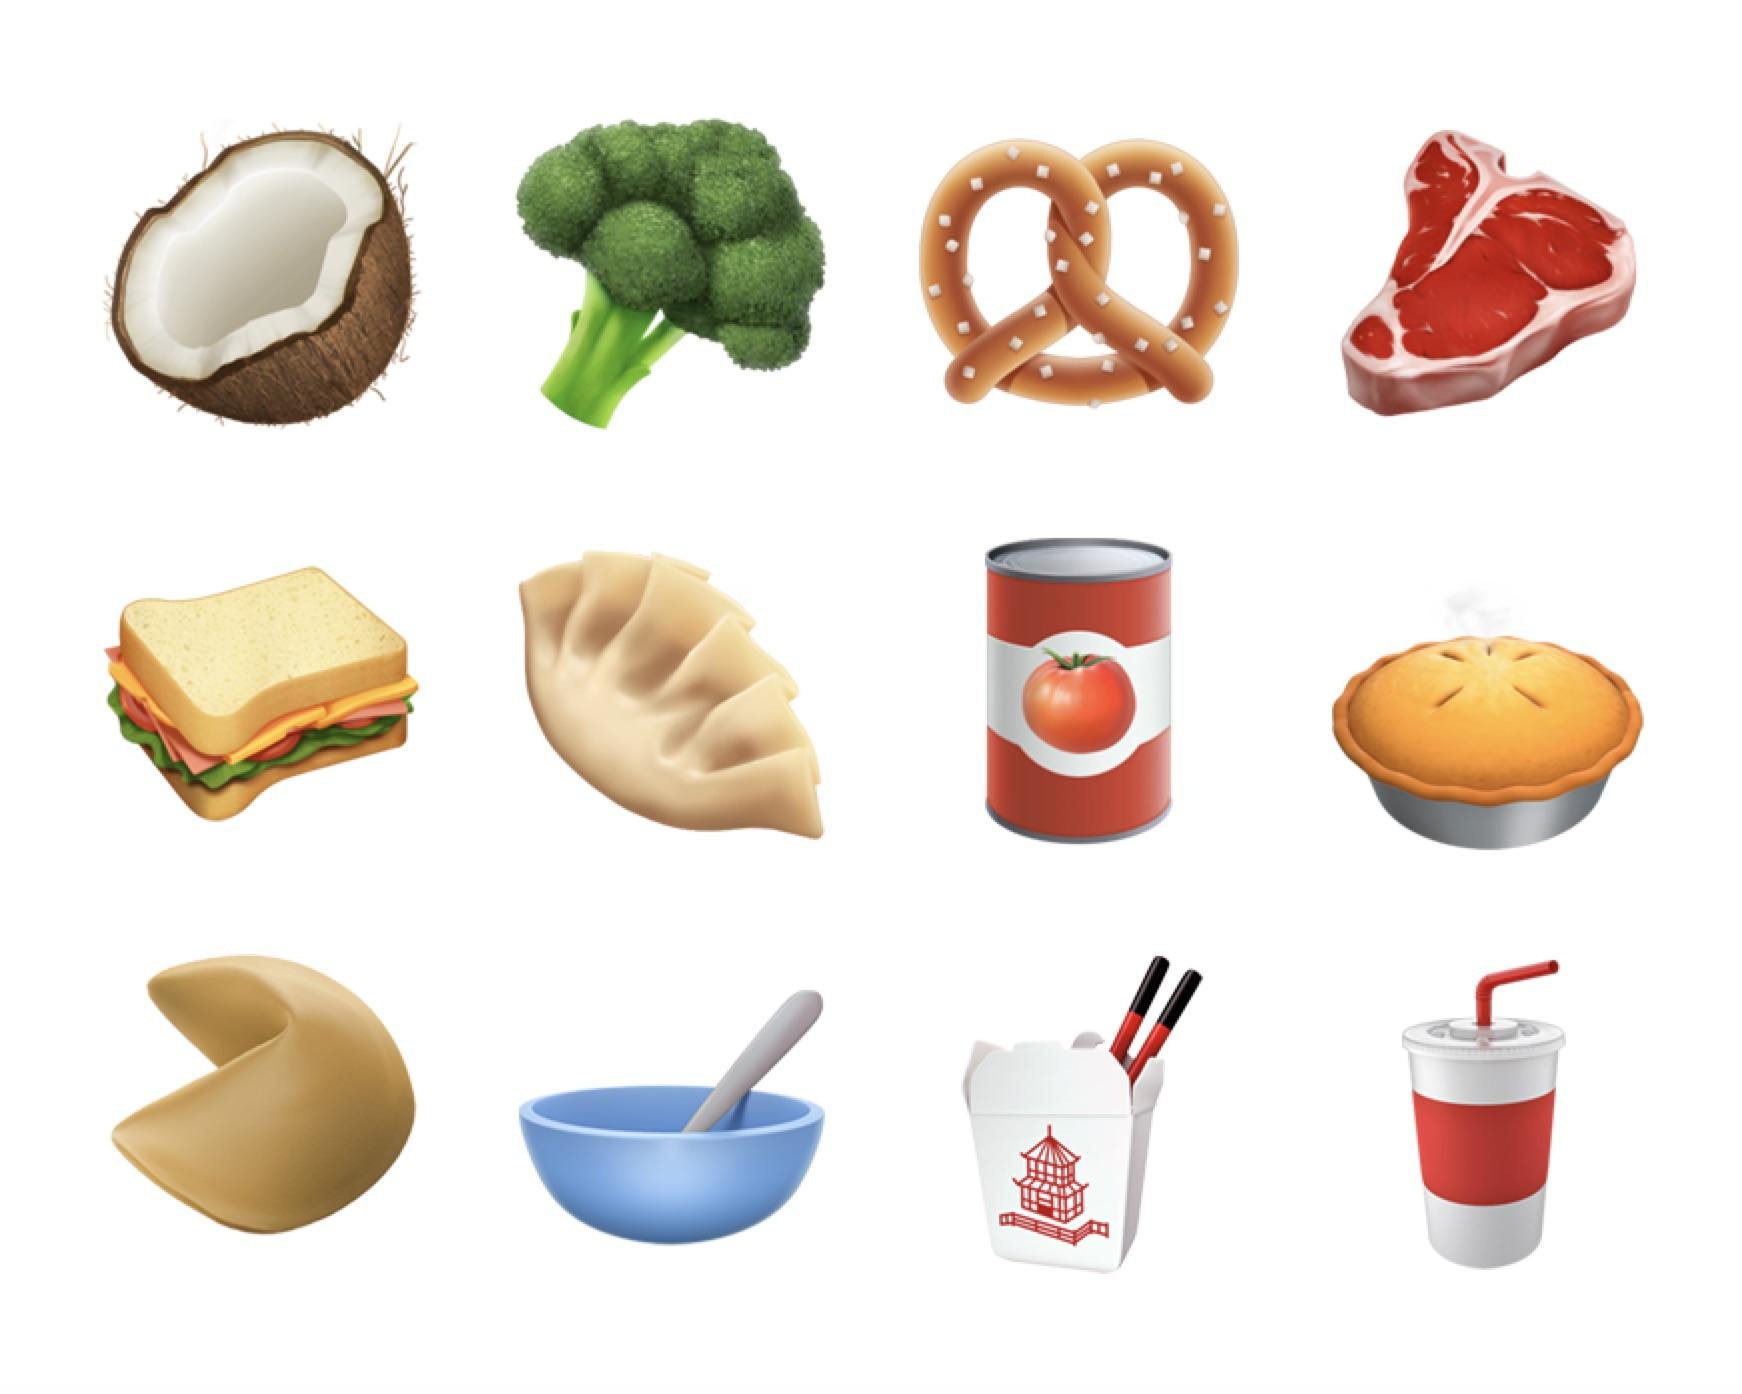 emoji-foods-ios-11-1-emojipedia